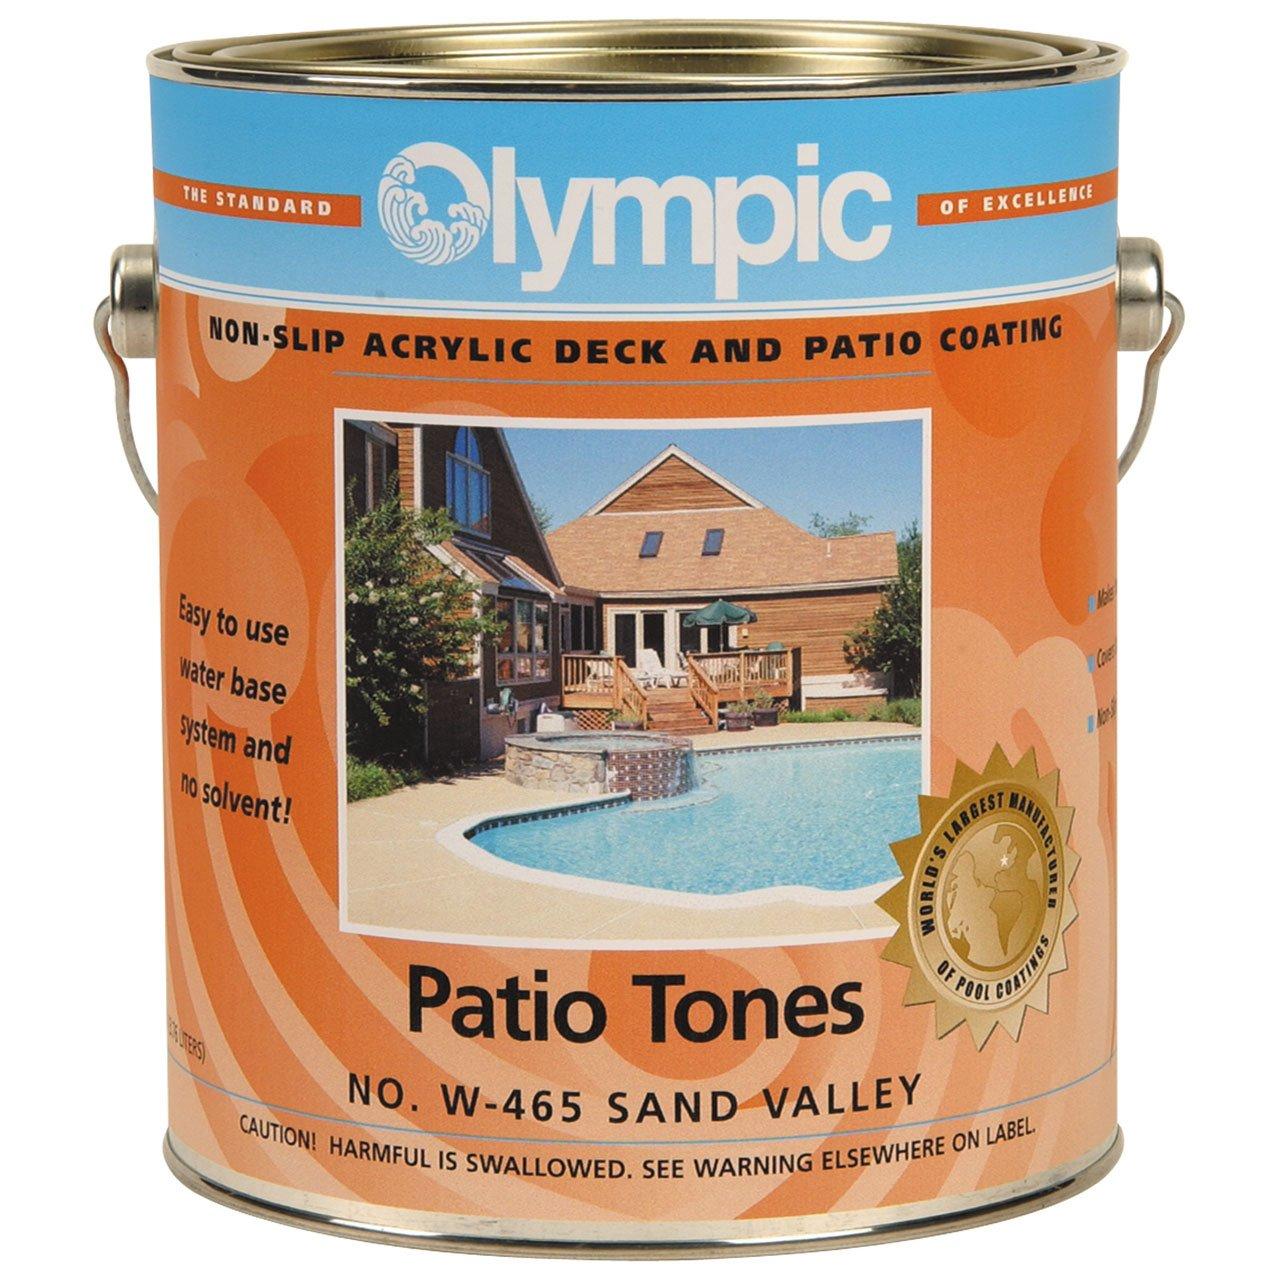 Amazon.com : Olympic Patio Tones Deck Coatings Sand Valley   1 Gallon :  Swimming Pool Deck Protective Coatings : Garden U0026 Outdoor